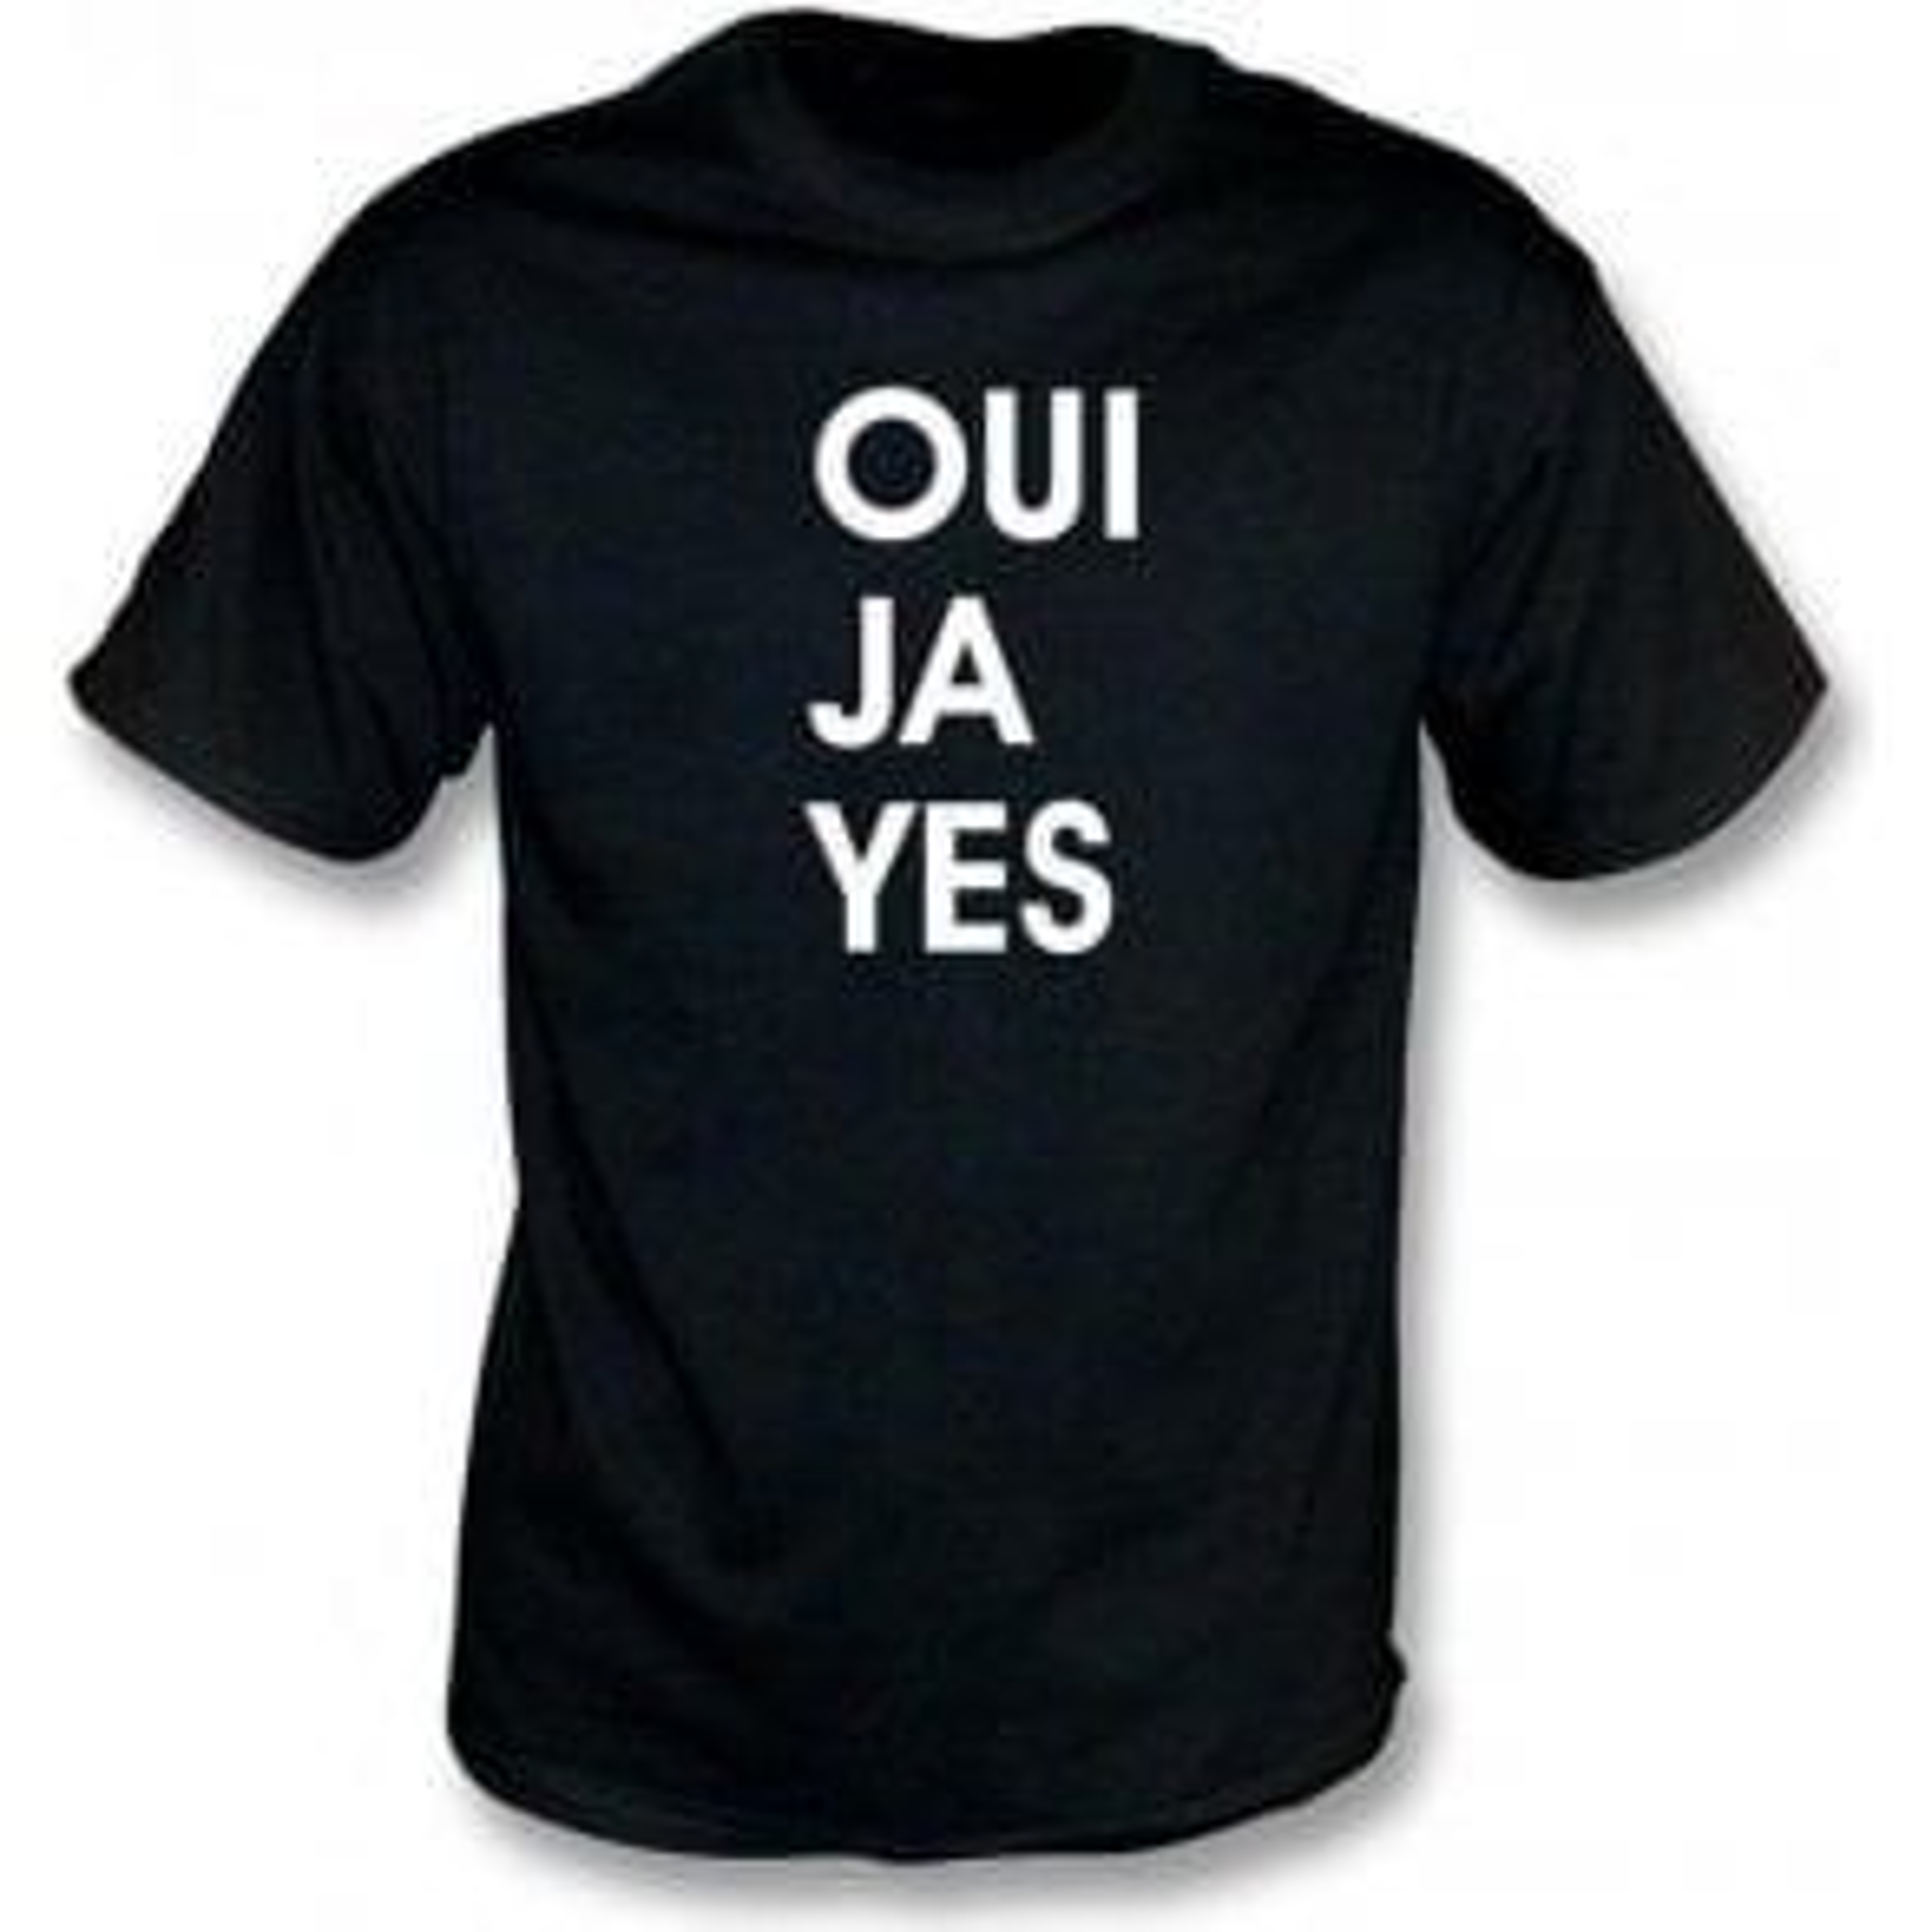 Oui Ja Yes (As Worn By Thom Yorke, Radiohead) T-Shirt